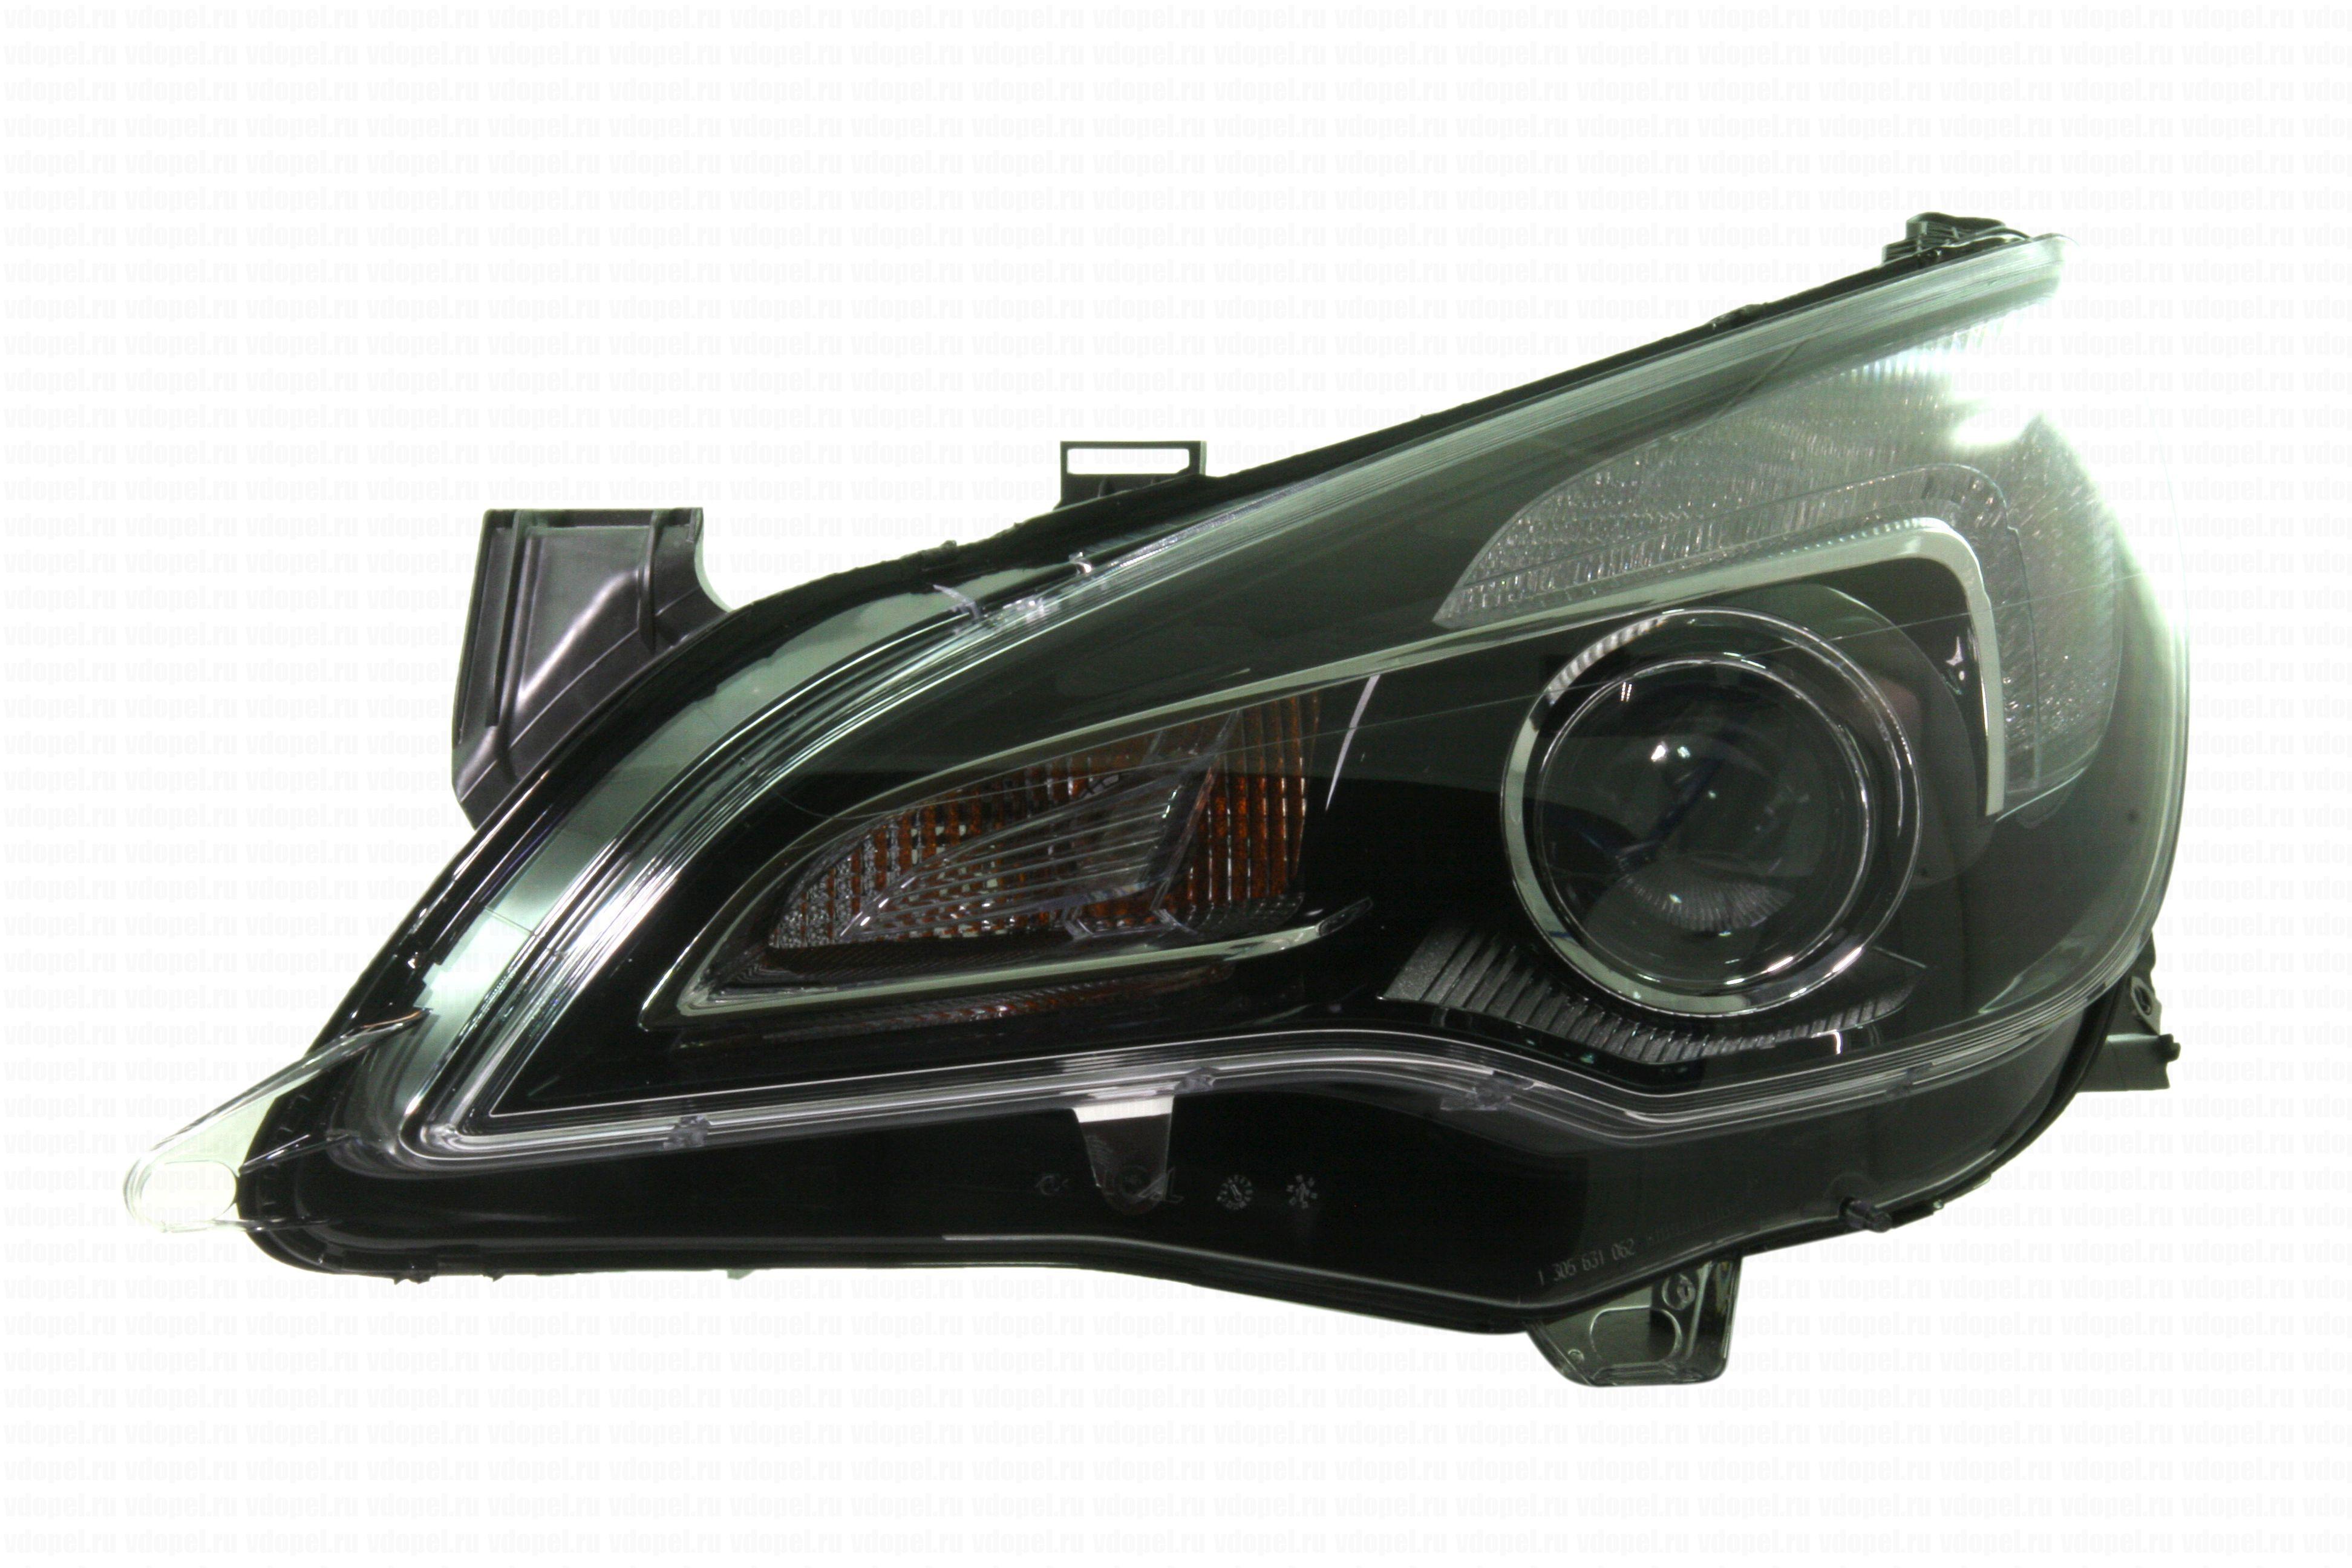 GM 39027951  - Фара Астра J 3дв. без ксенона GM лев.